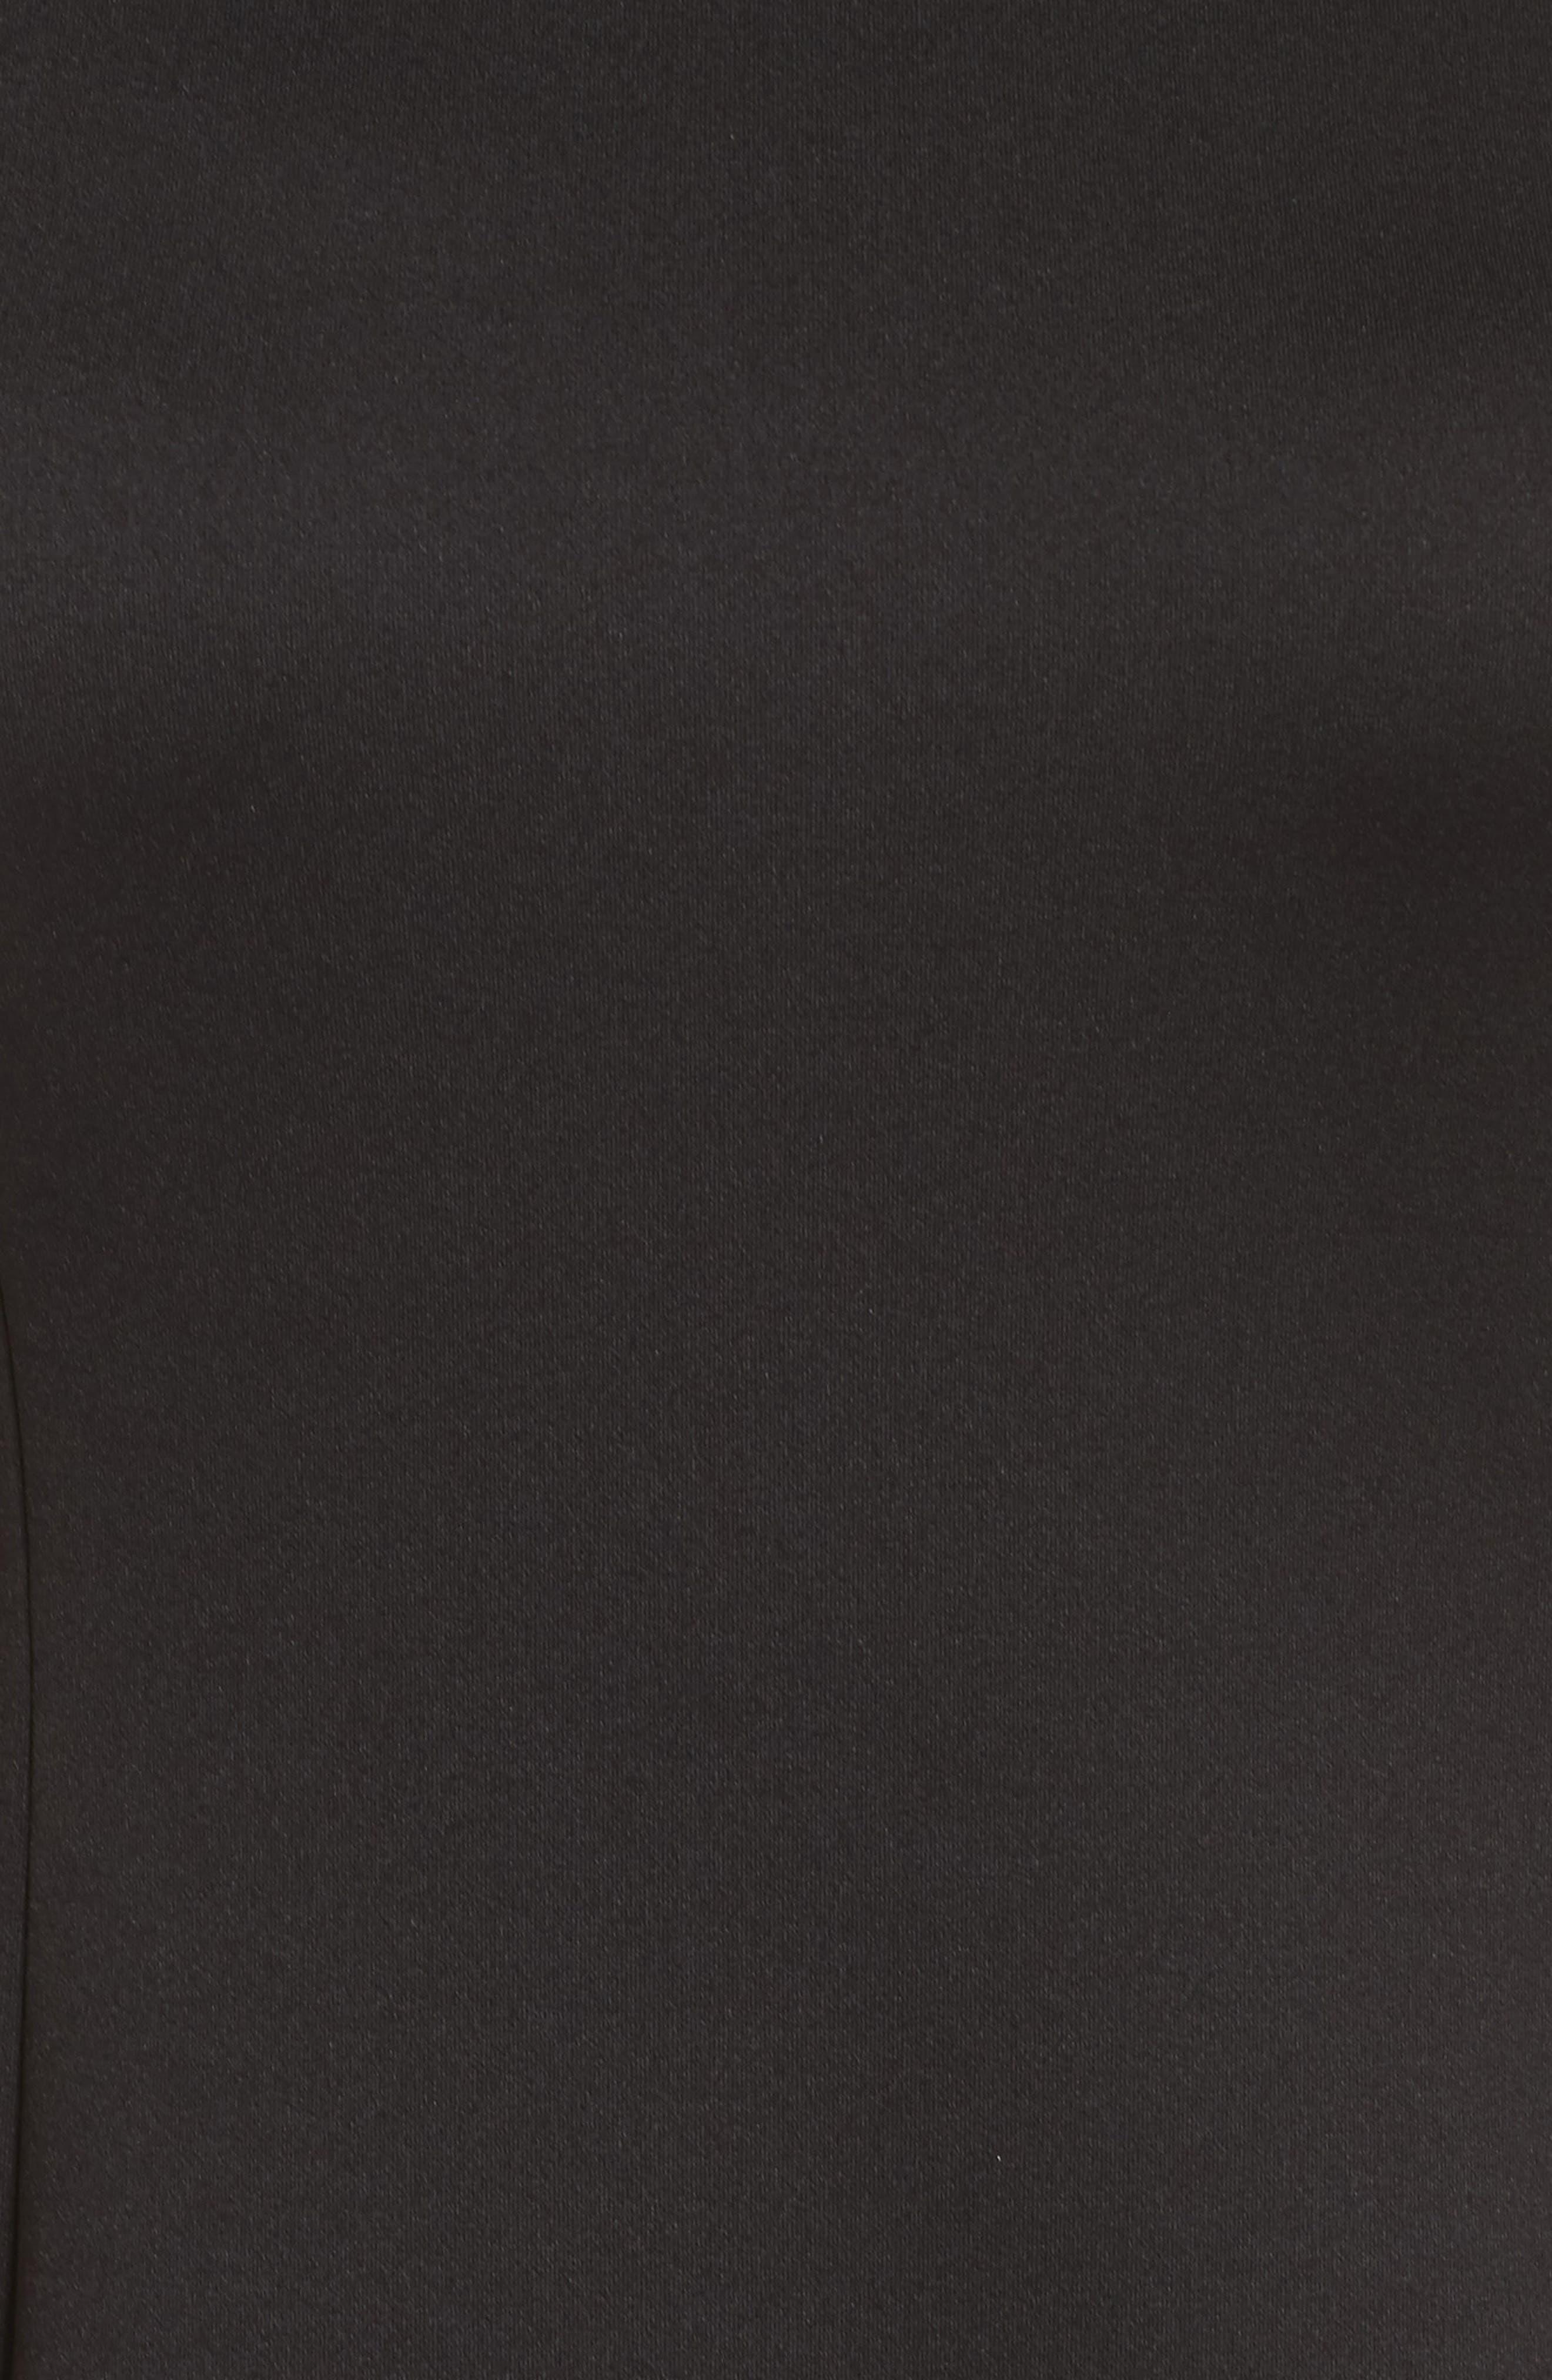 Midi Bell Dress,                             Alternate thumbnail 5, color,                             001